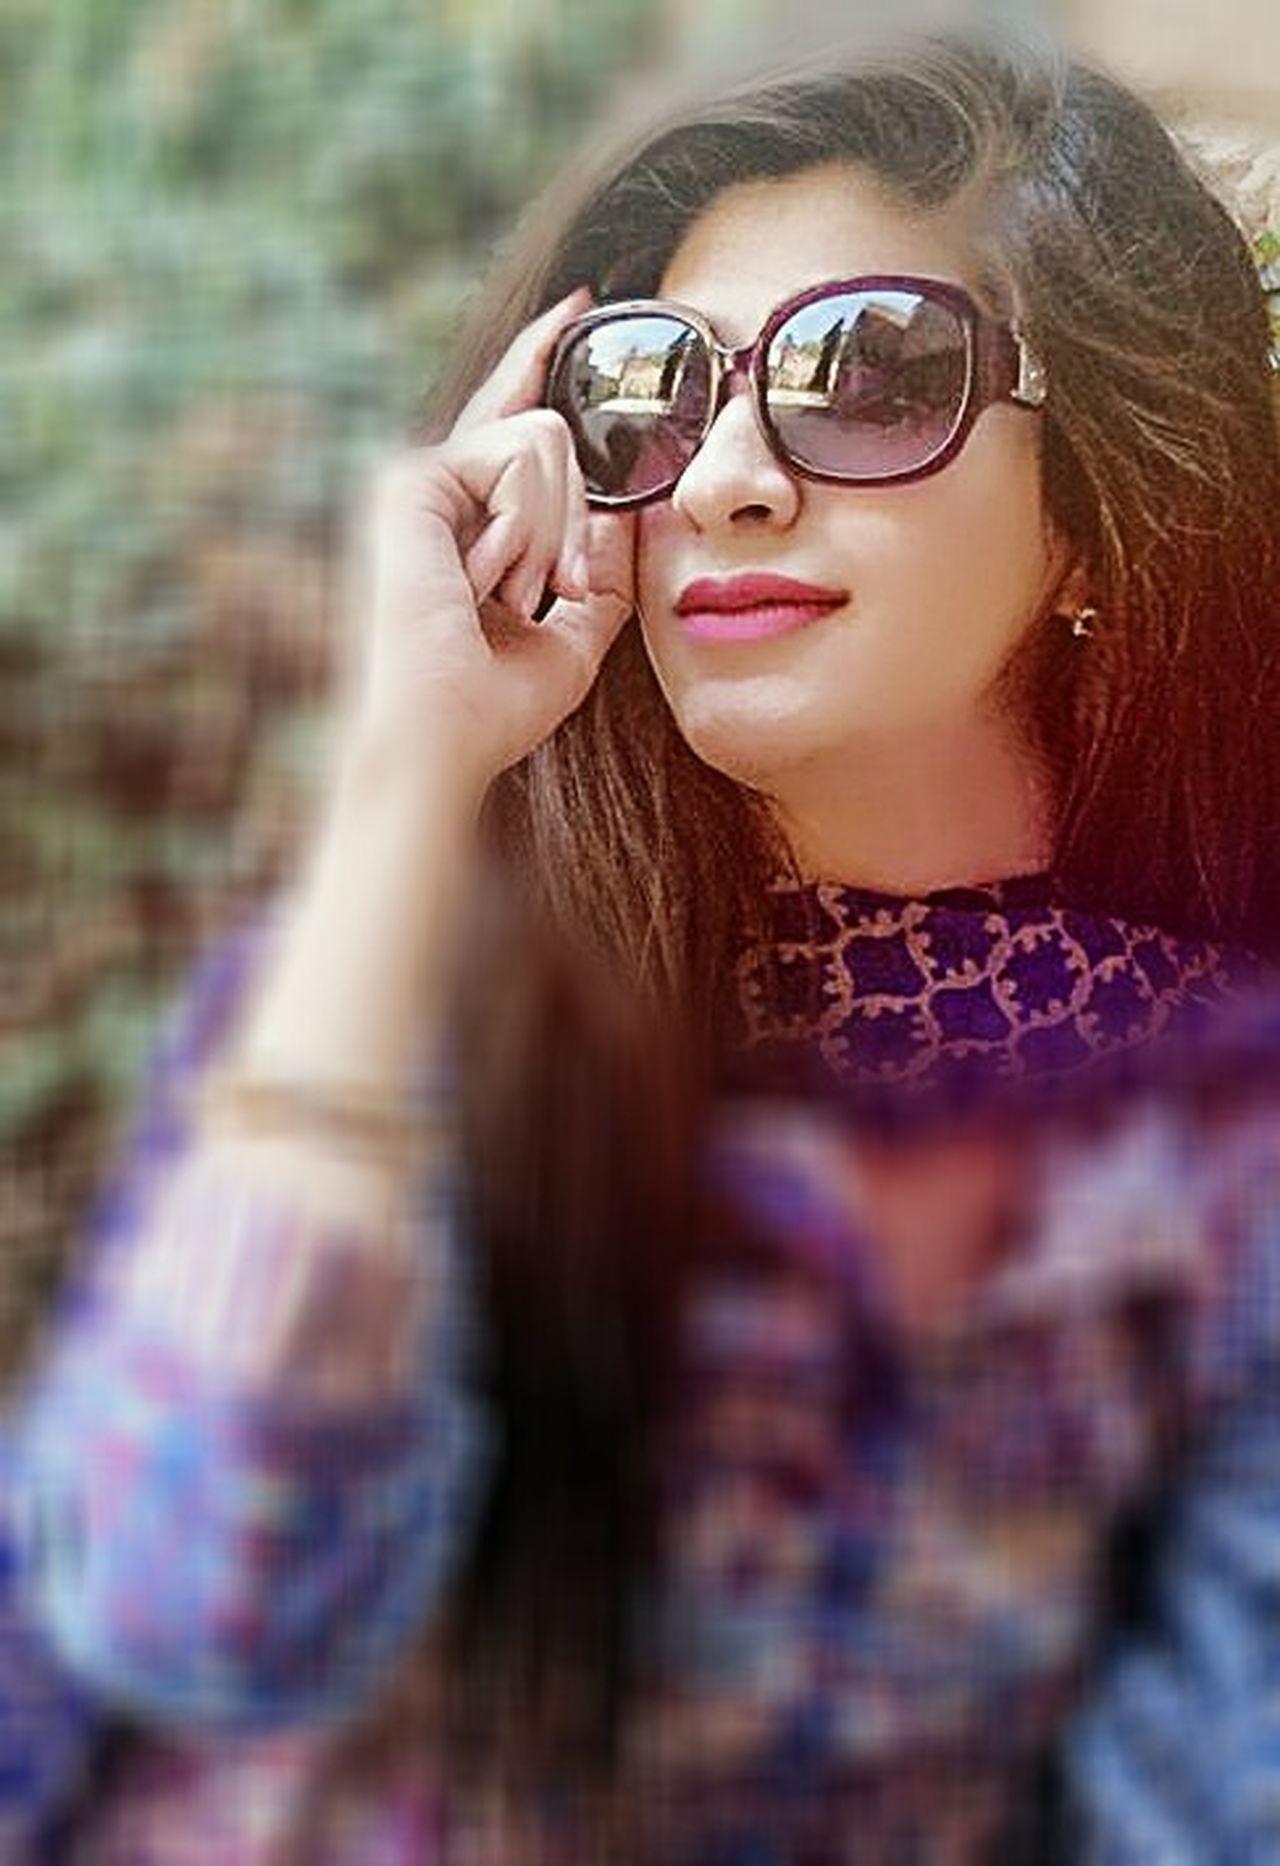 Summer shades Adult Smiling Beauty People Summer Portrait Young Women Females Eyeglasses  GUCCI Pretty Pretty Girl Pakistani Outdoors Lover Urvahocain Marwa Pakistani Wedding Modeling Fashion Model Beautiful People Selfie ✌